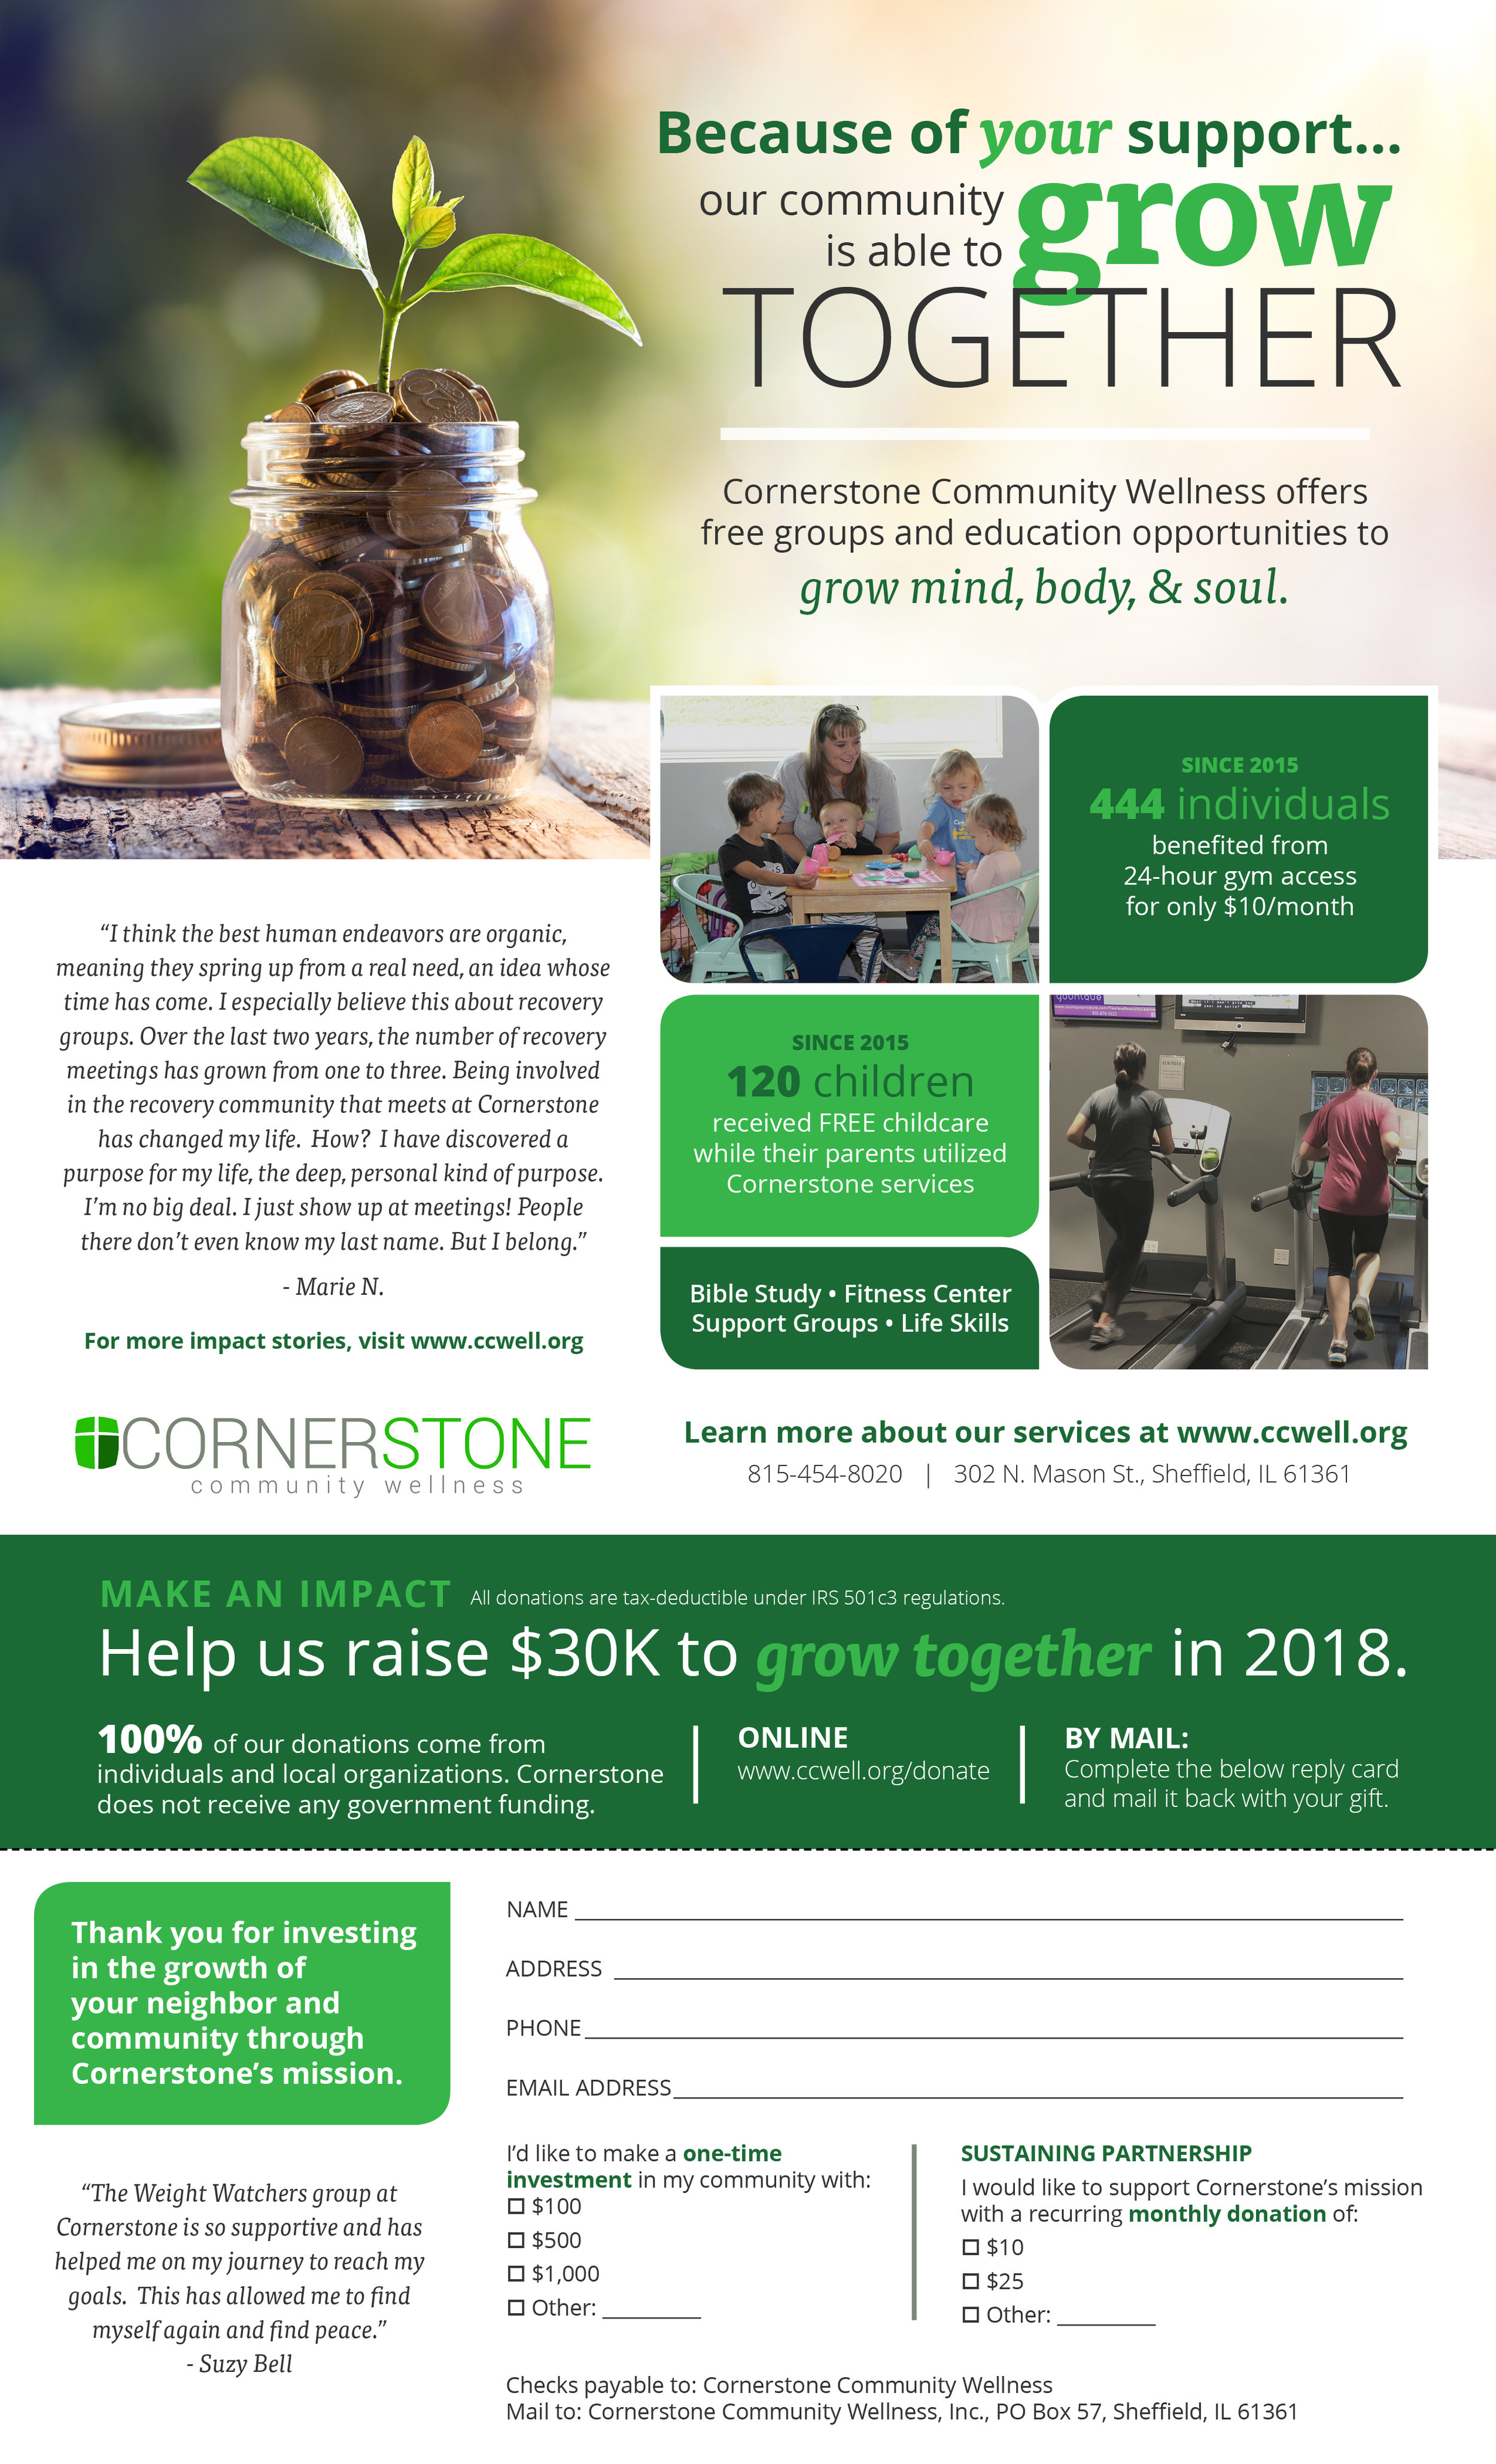 Cornerstone Community Wellness Year End Appeal